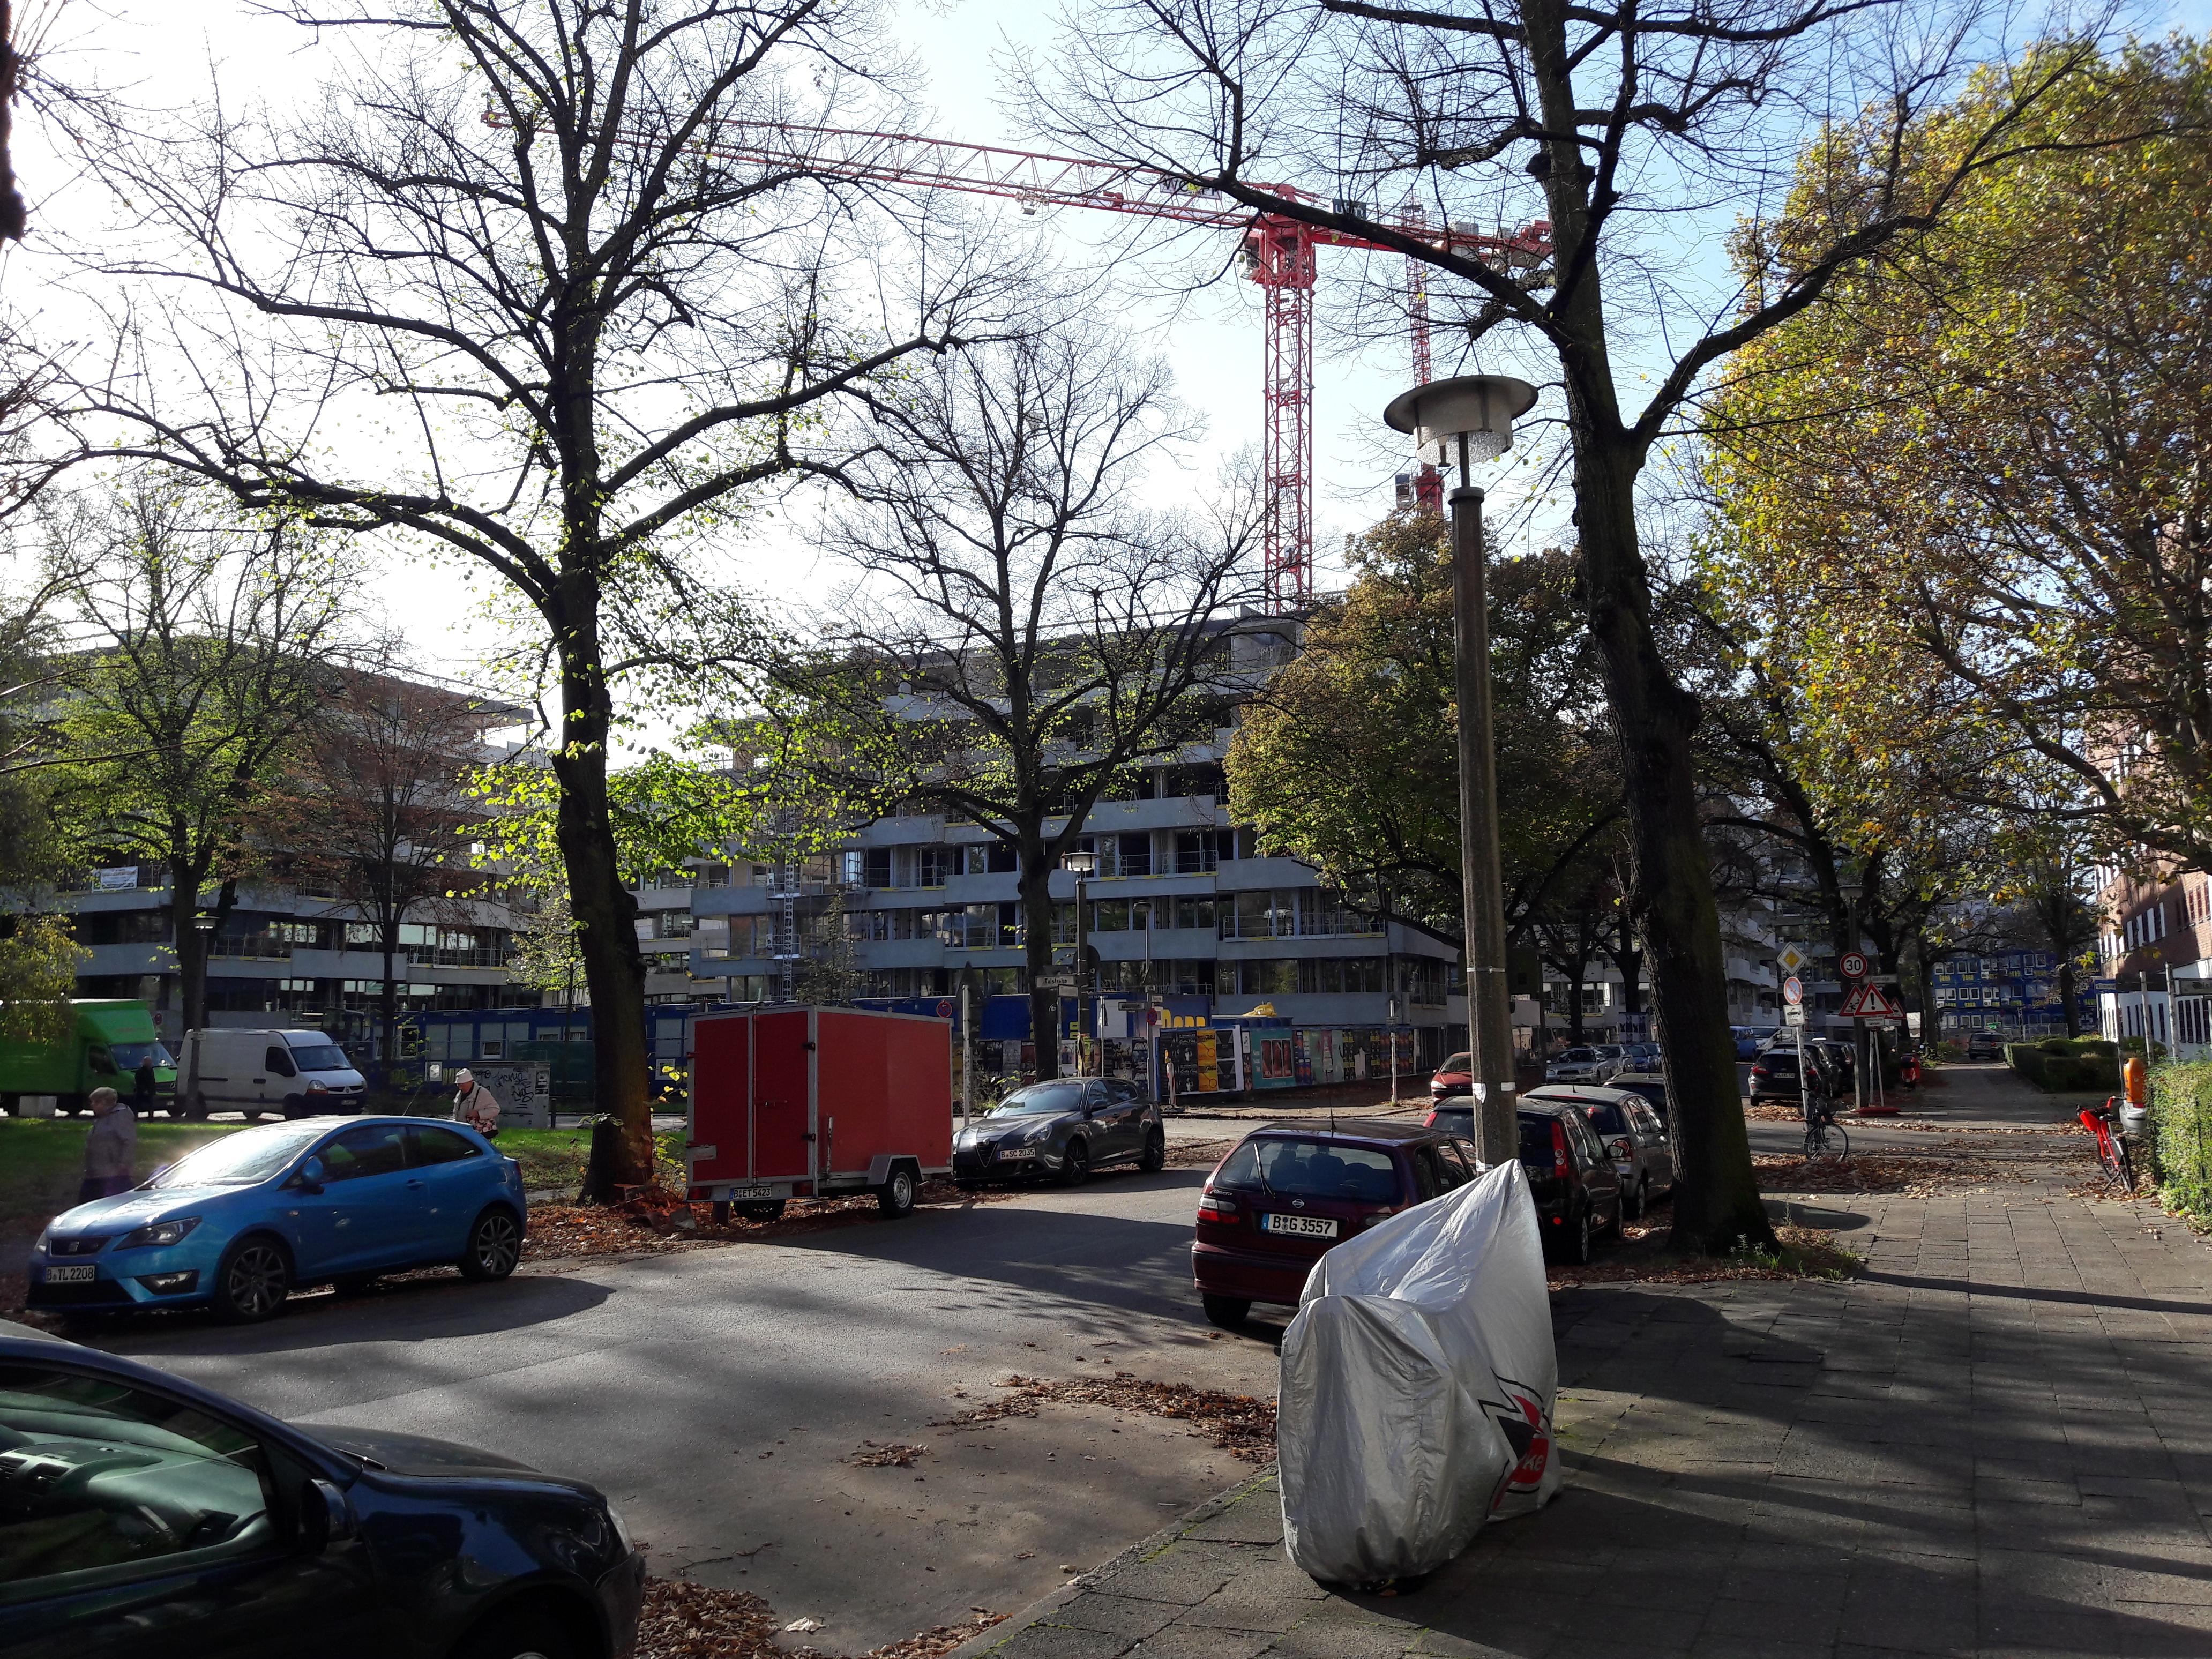 Neubau-Gartenstadt-Berlin.jpg